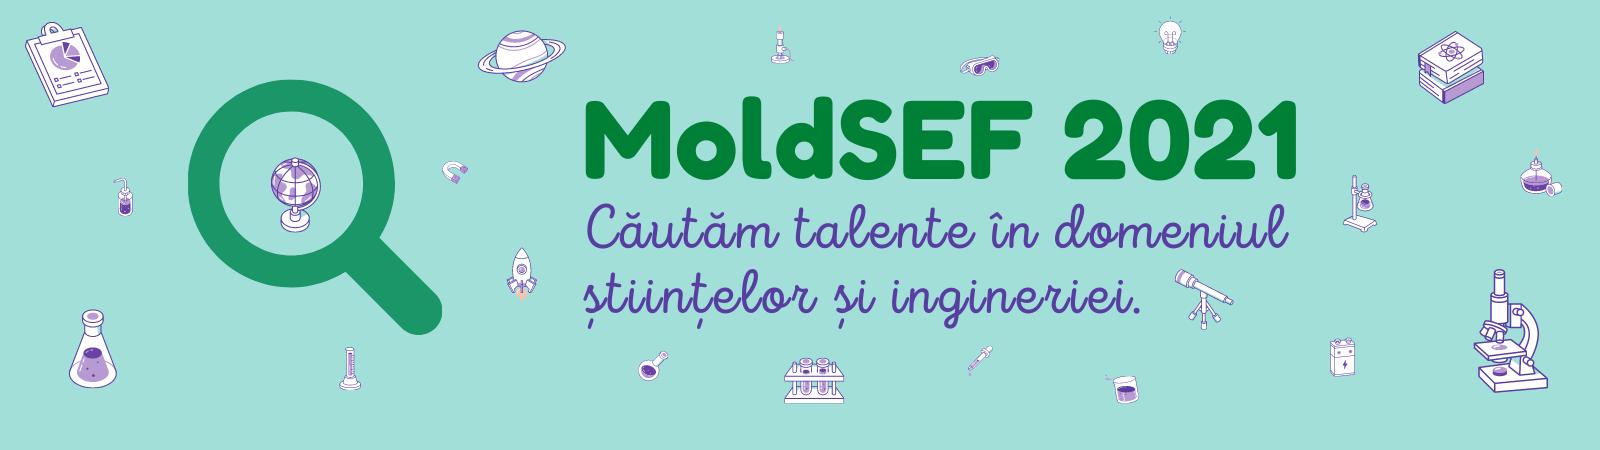 Mold SEF